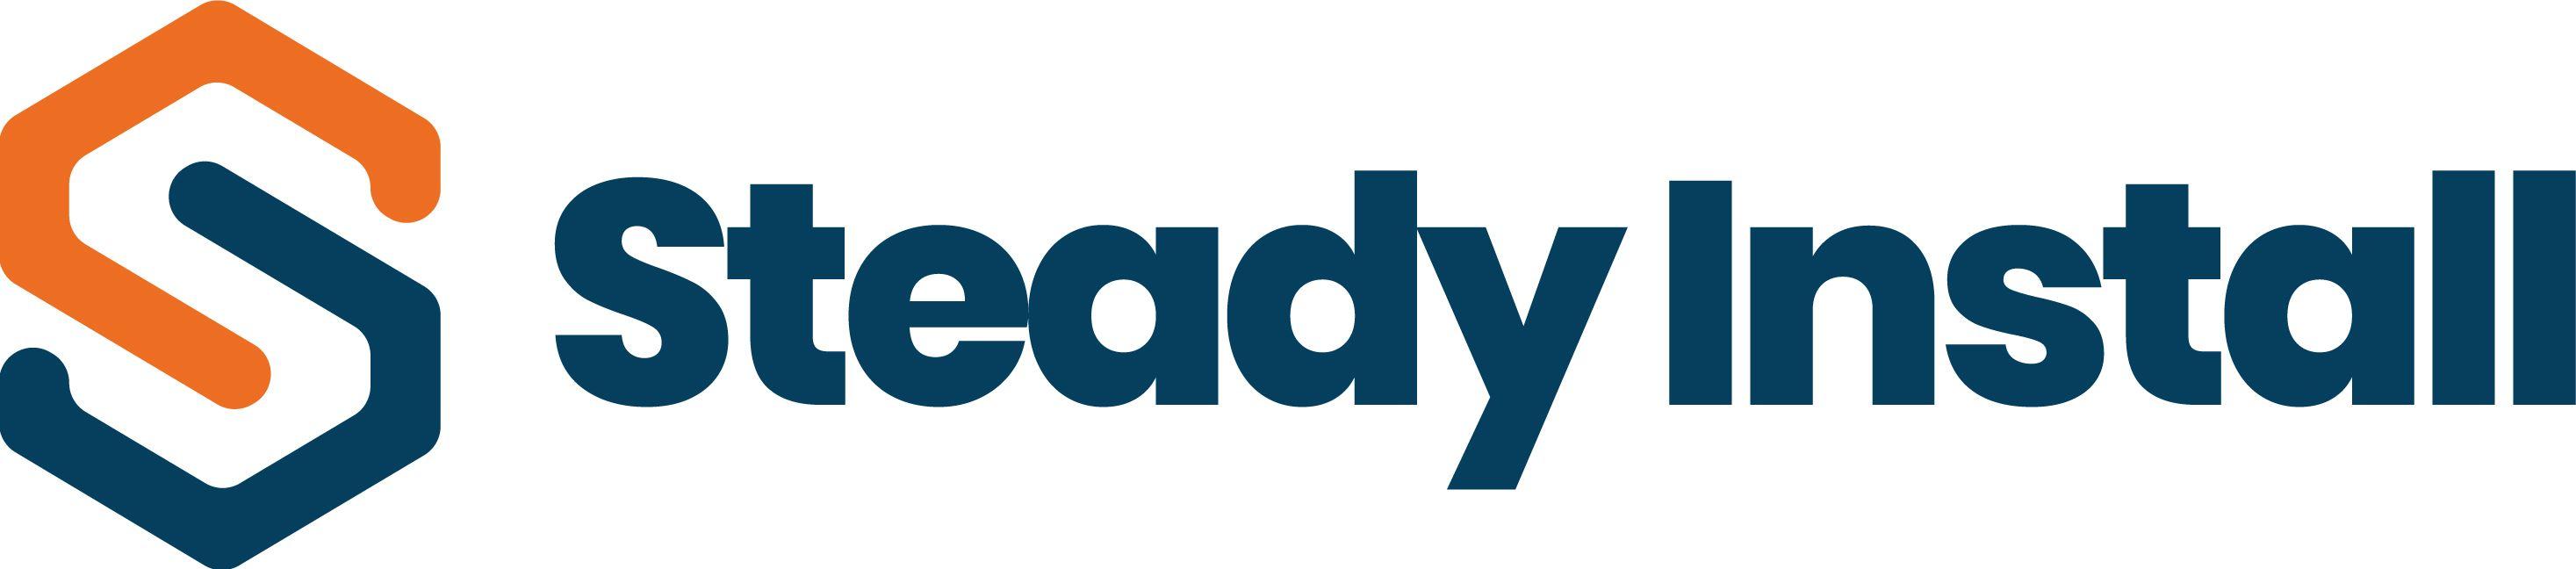 steadyinstall Logo